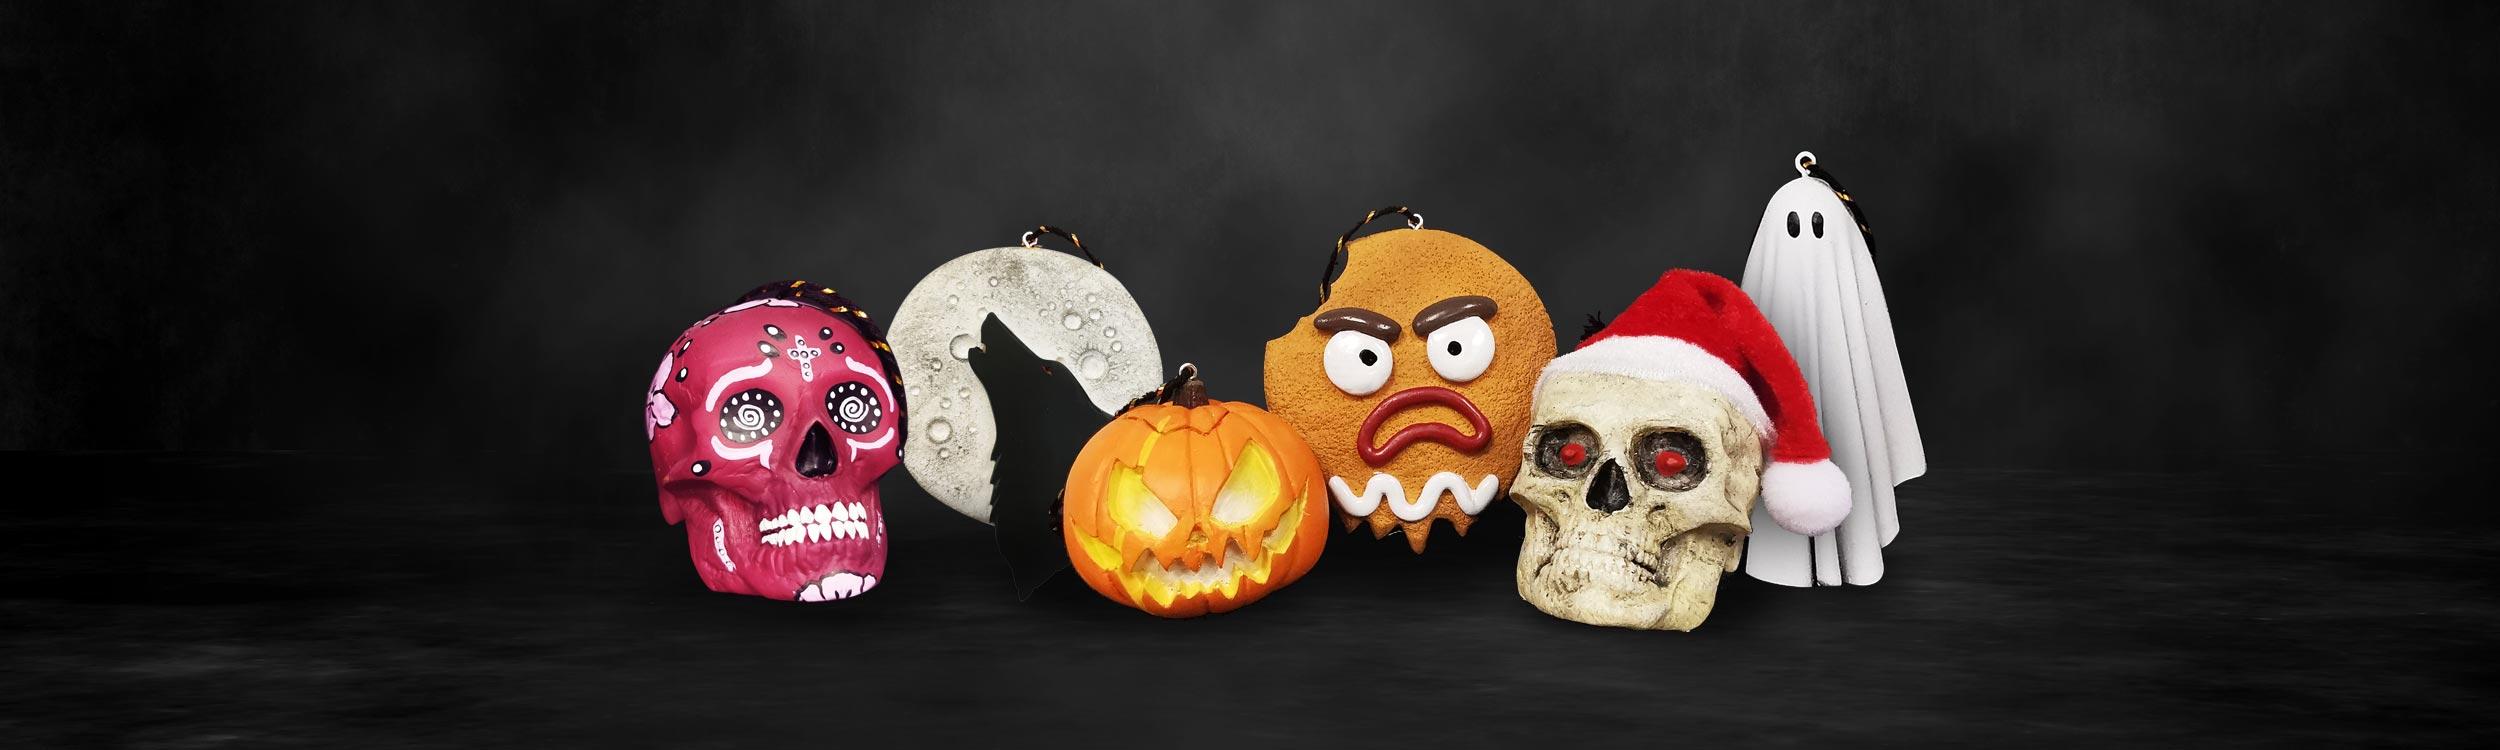 Photo of 3 Halloweenmas Ornaments